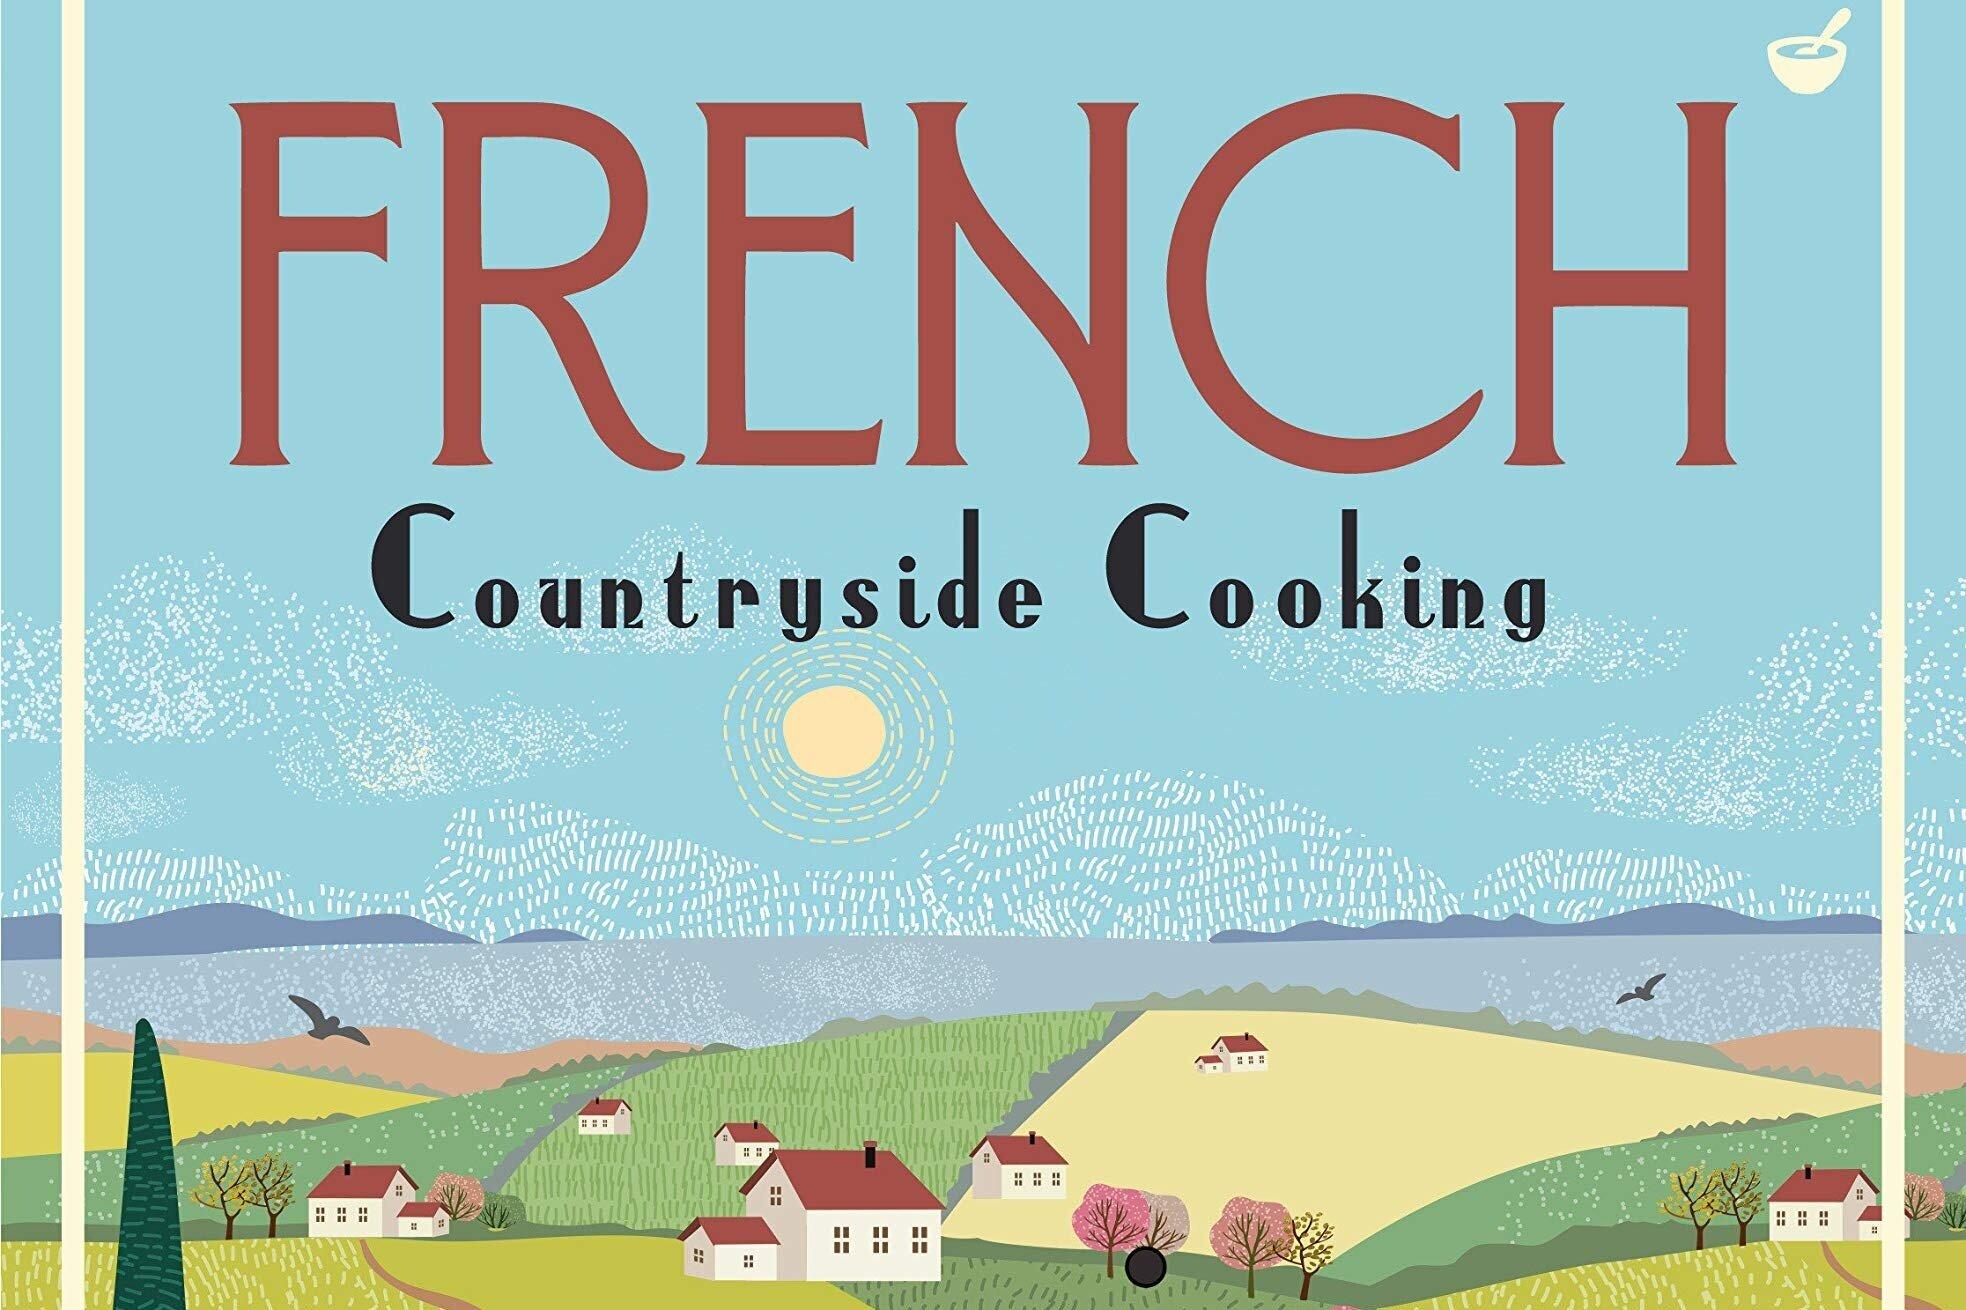 FrenchCountrysideCooking.jpg